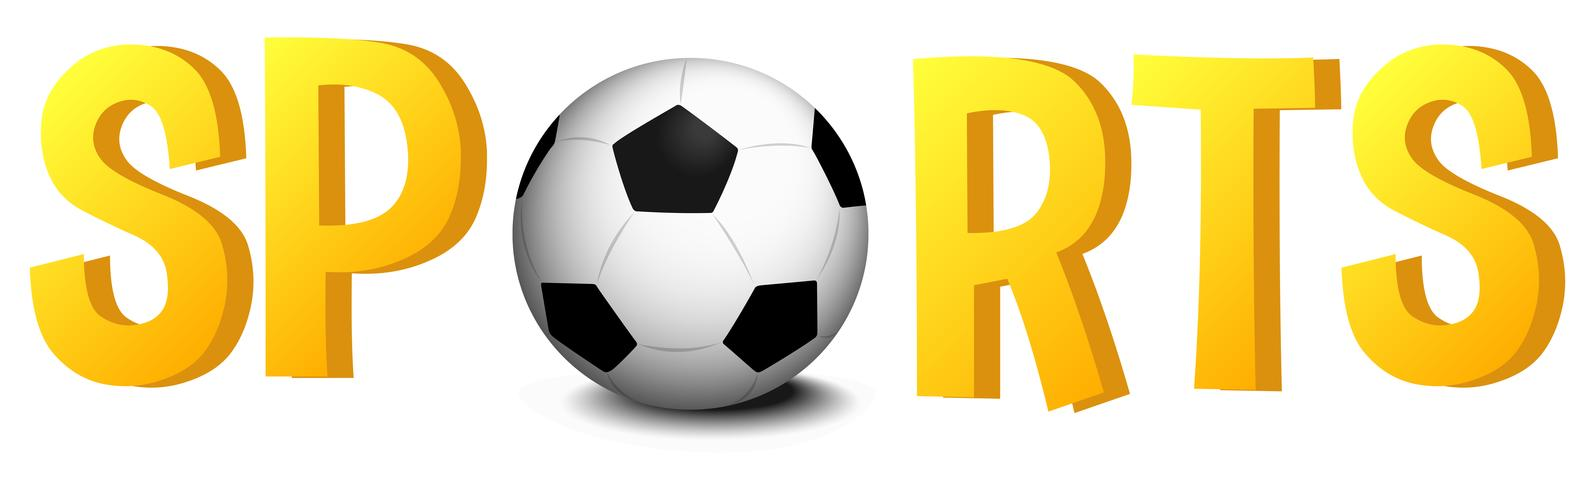 Teckensnittsdesign med ordsporter med fotboll vektor